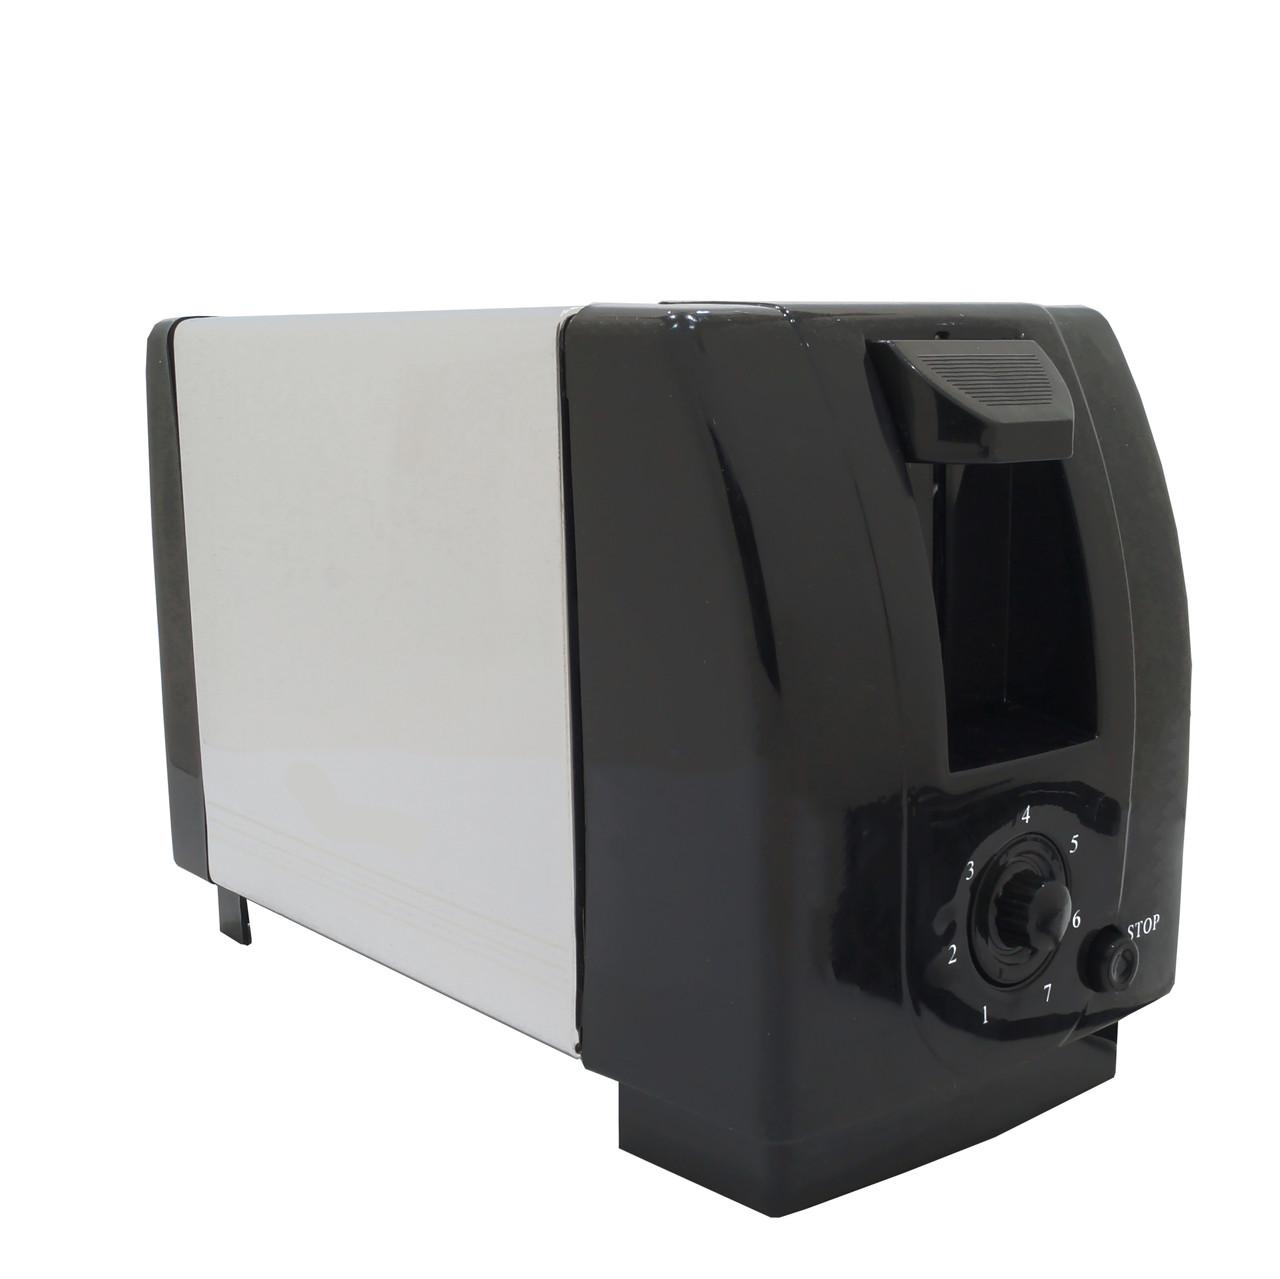 Тостер DT 1304 распродажа